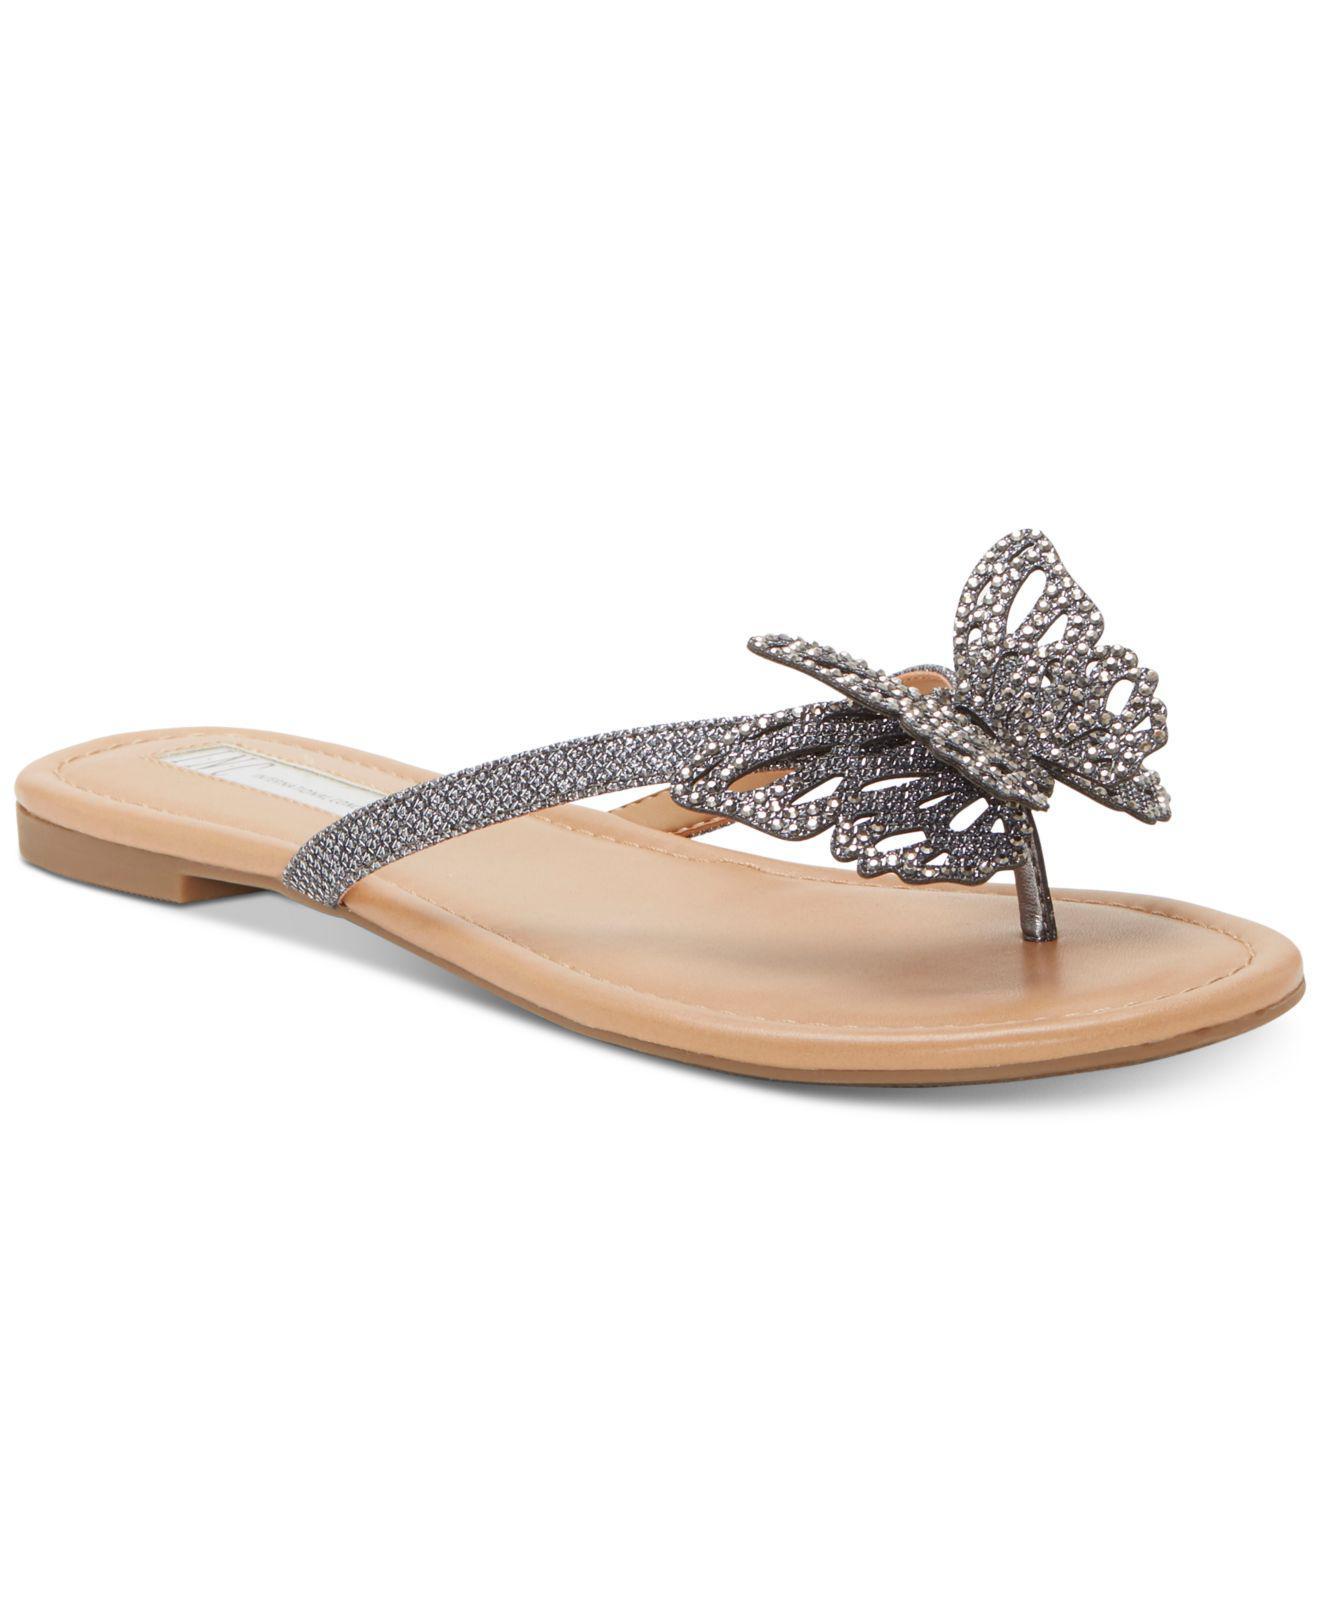 4a081f7dd05374 INC International Concepts. Women s Marsha Butterfly Flip-flop Sandals ...